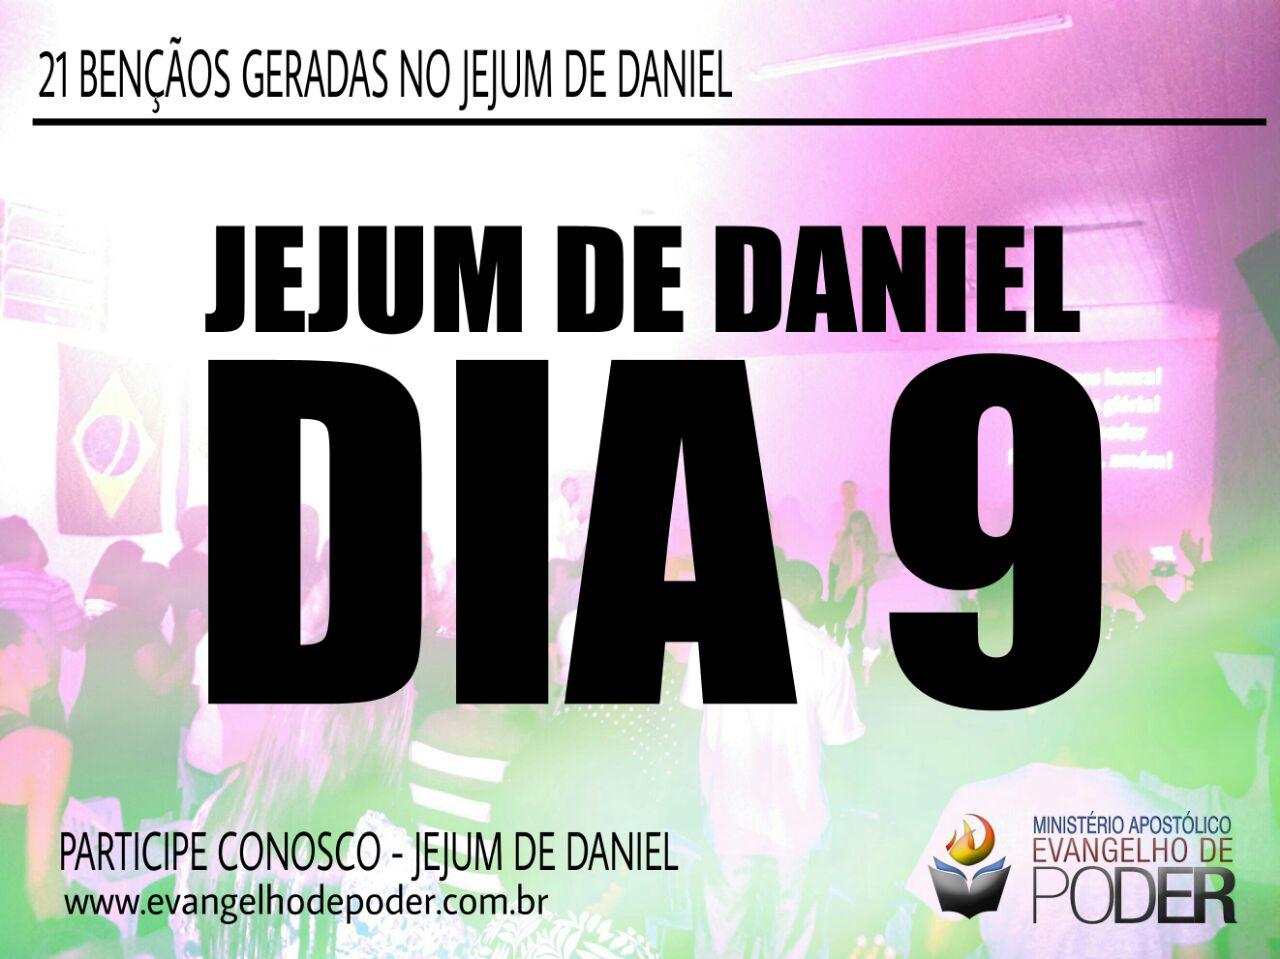 JEJUM DE DANIEL 9° DIA